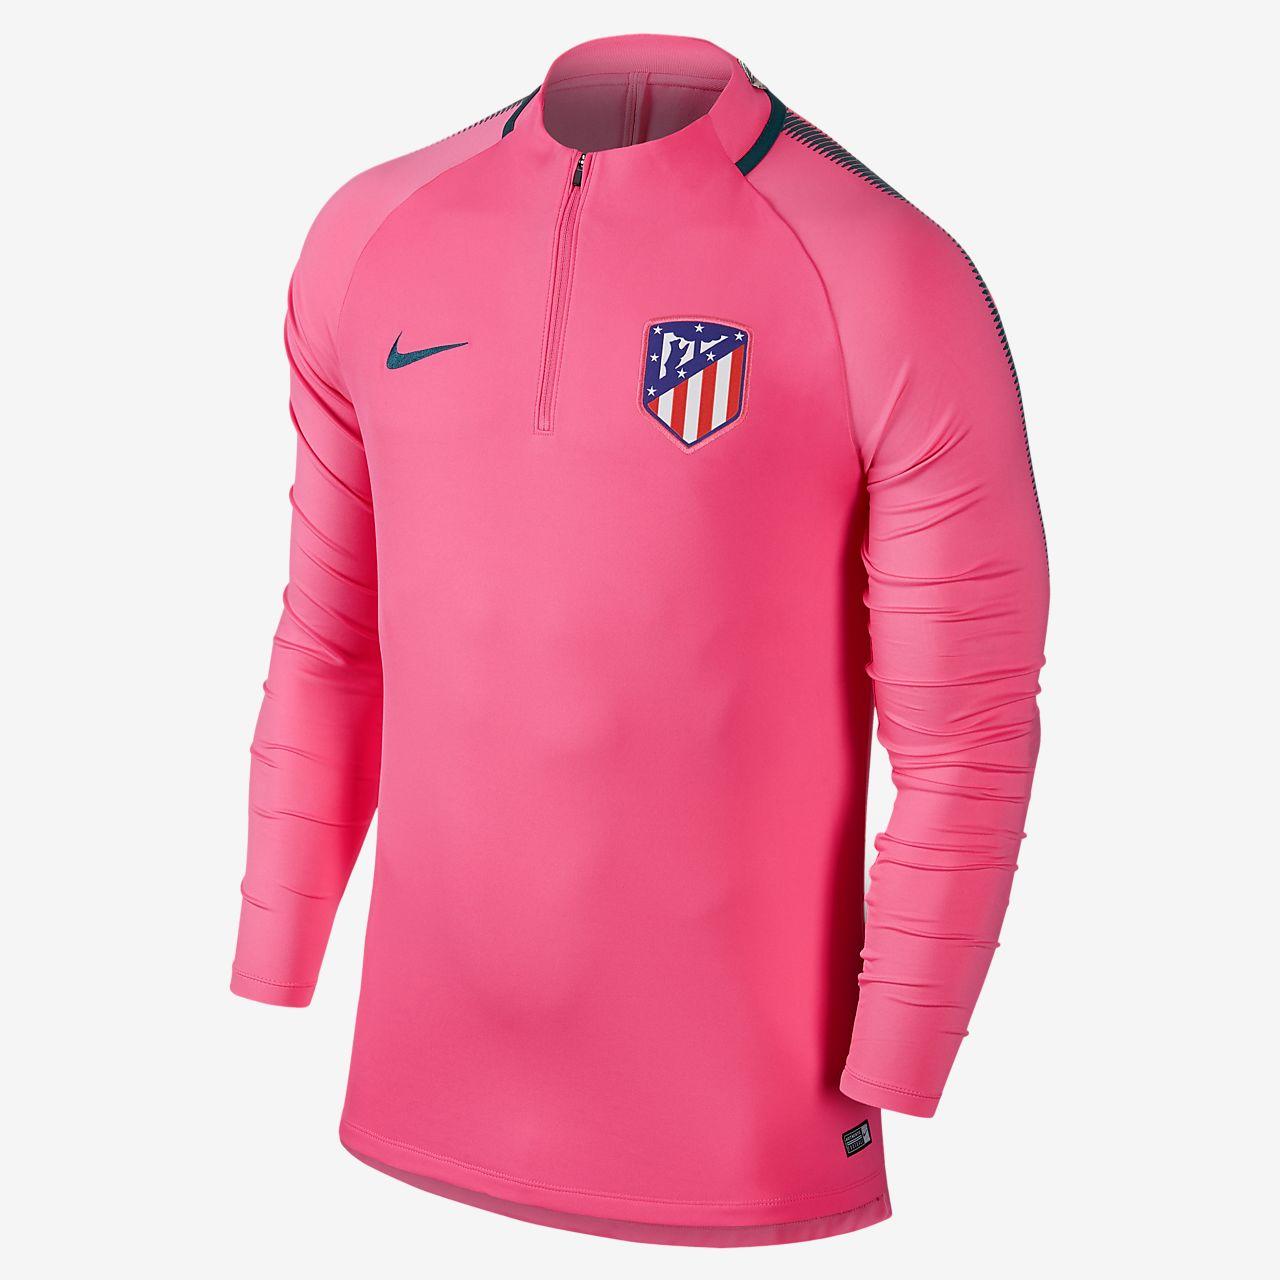 ... Atletico de Madrid Dri-FIT Squad Drill Men's Football Top